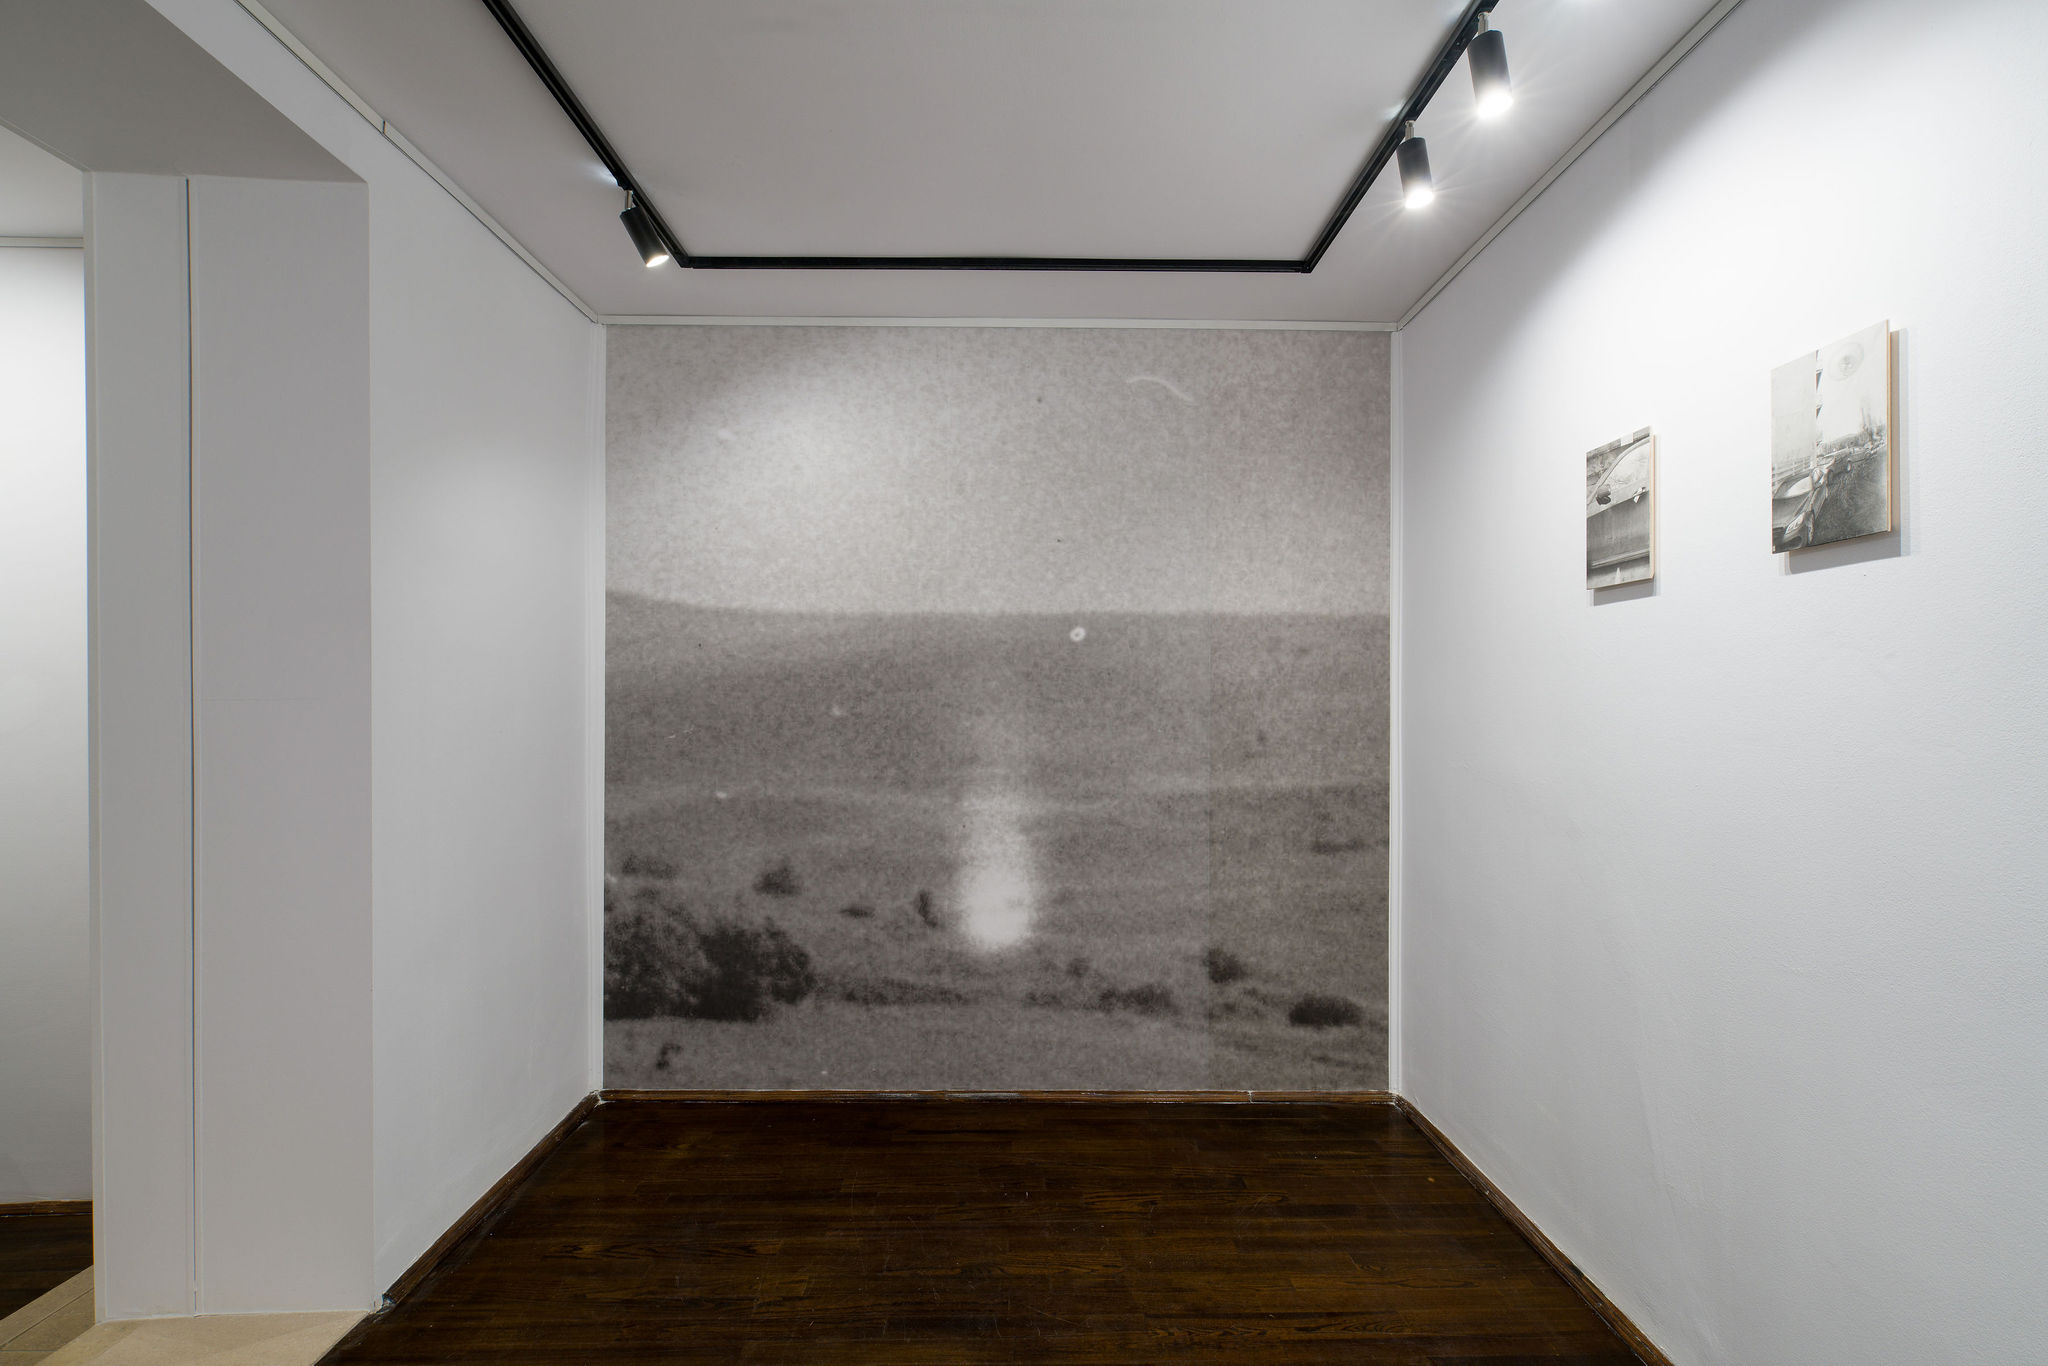 Wall: photograph from archive A. Pătruț: Alexandru Sift, White Bioplasmatic Globe, 1976